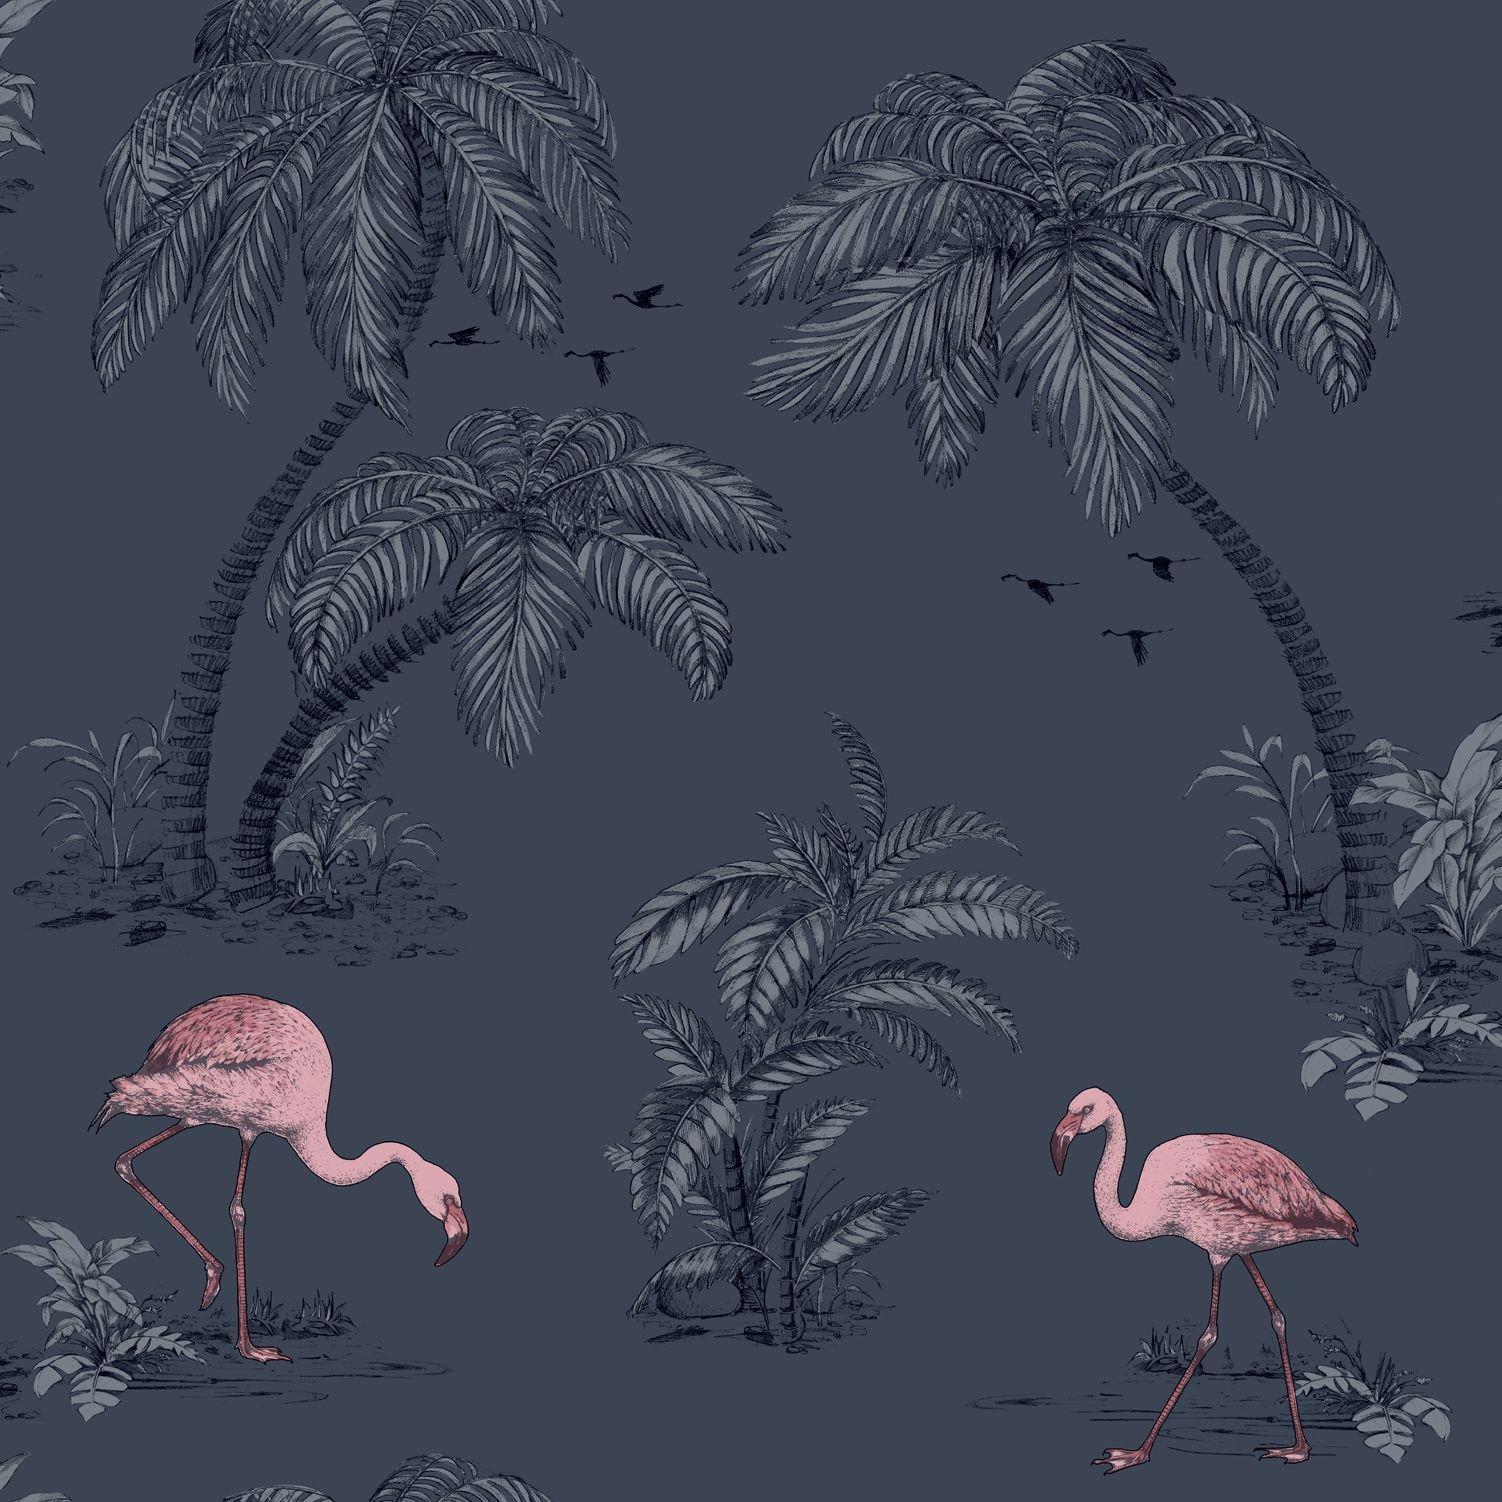 обои с фламинго для стен леруа мерлен или профили алюминия